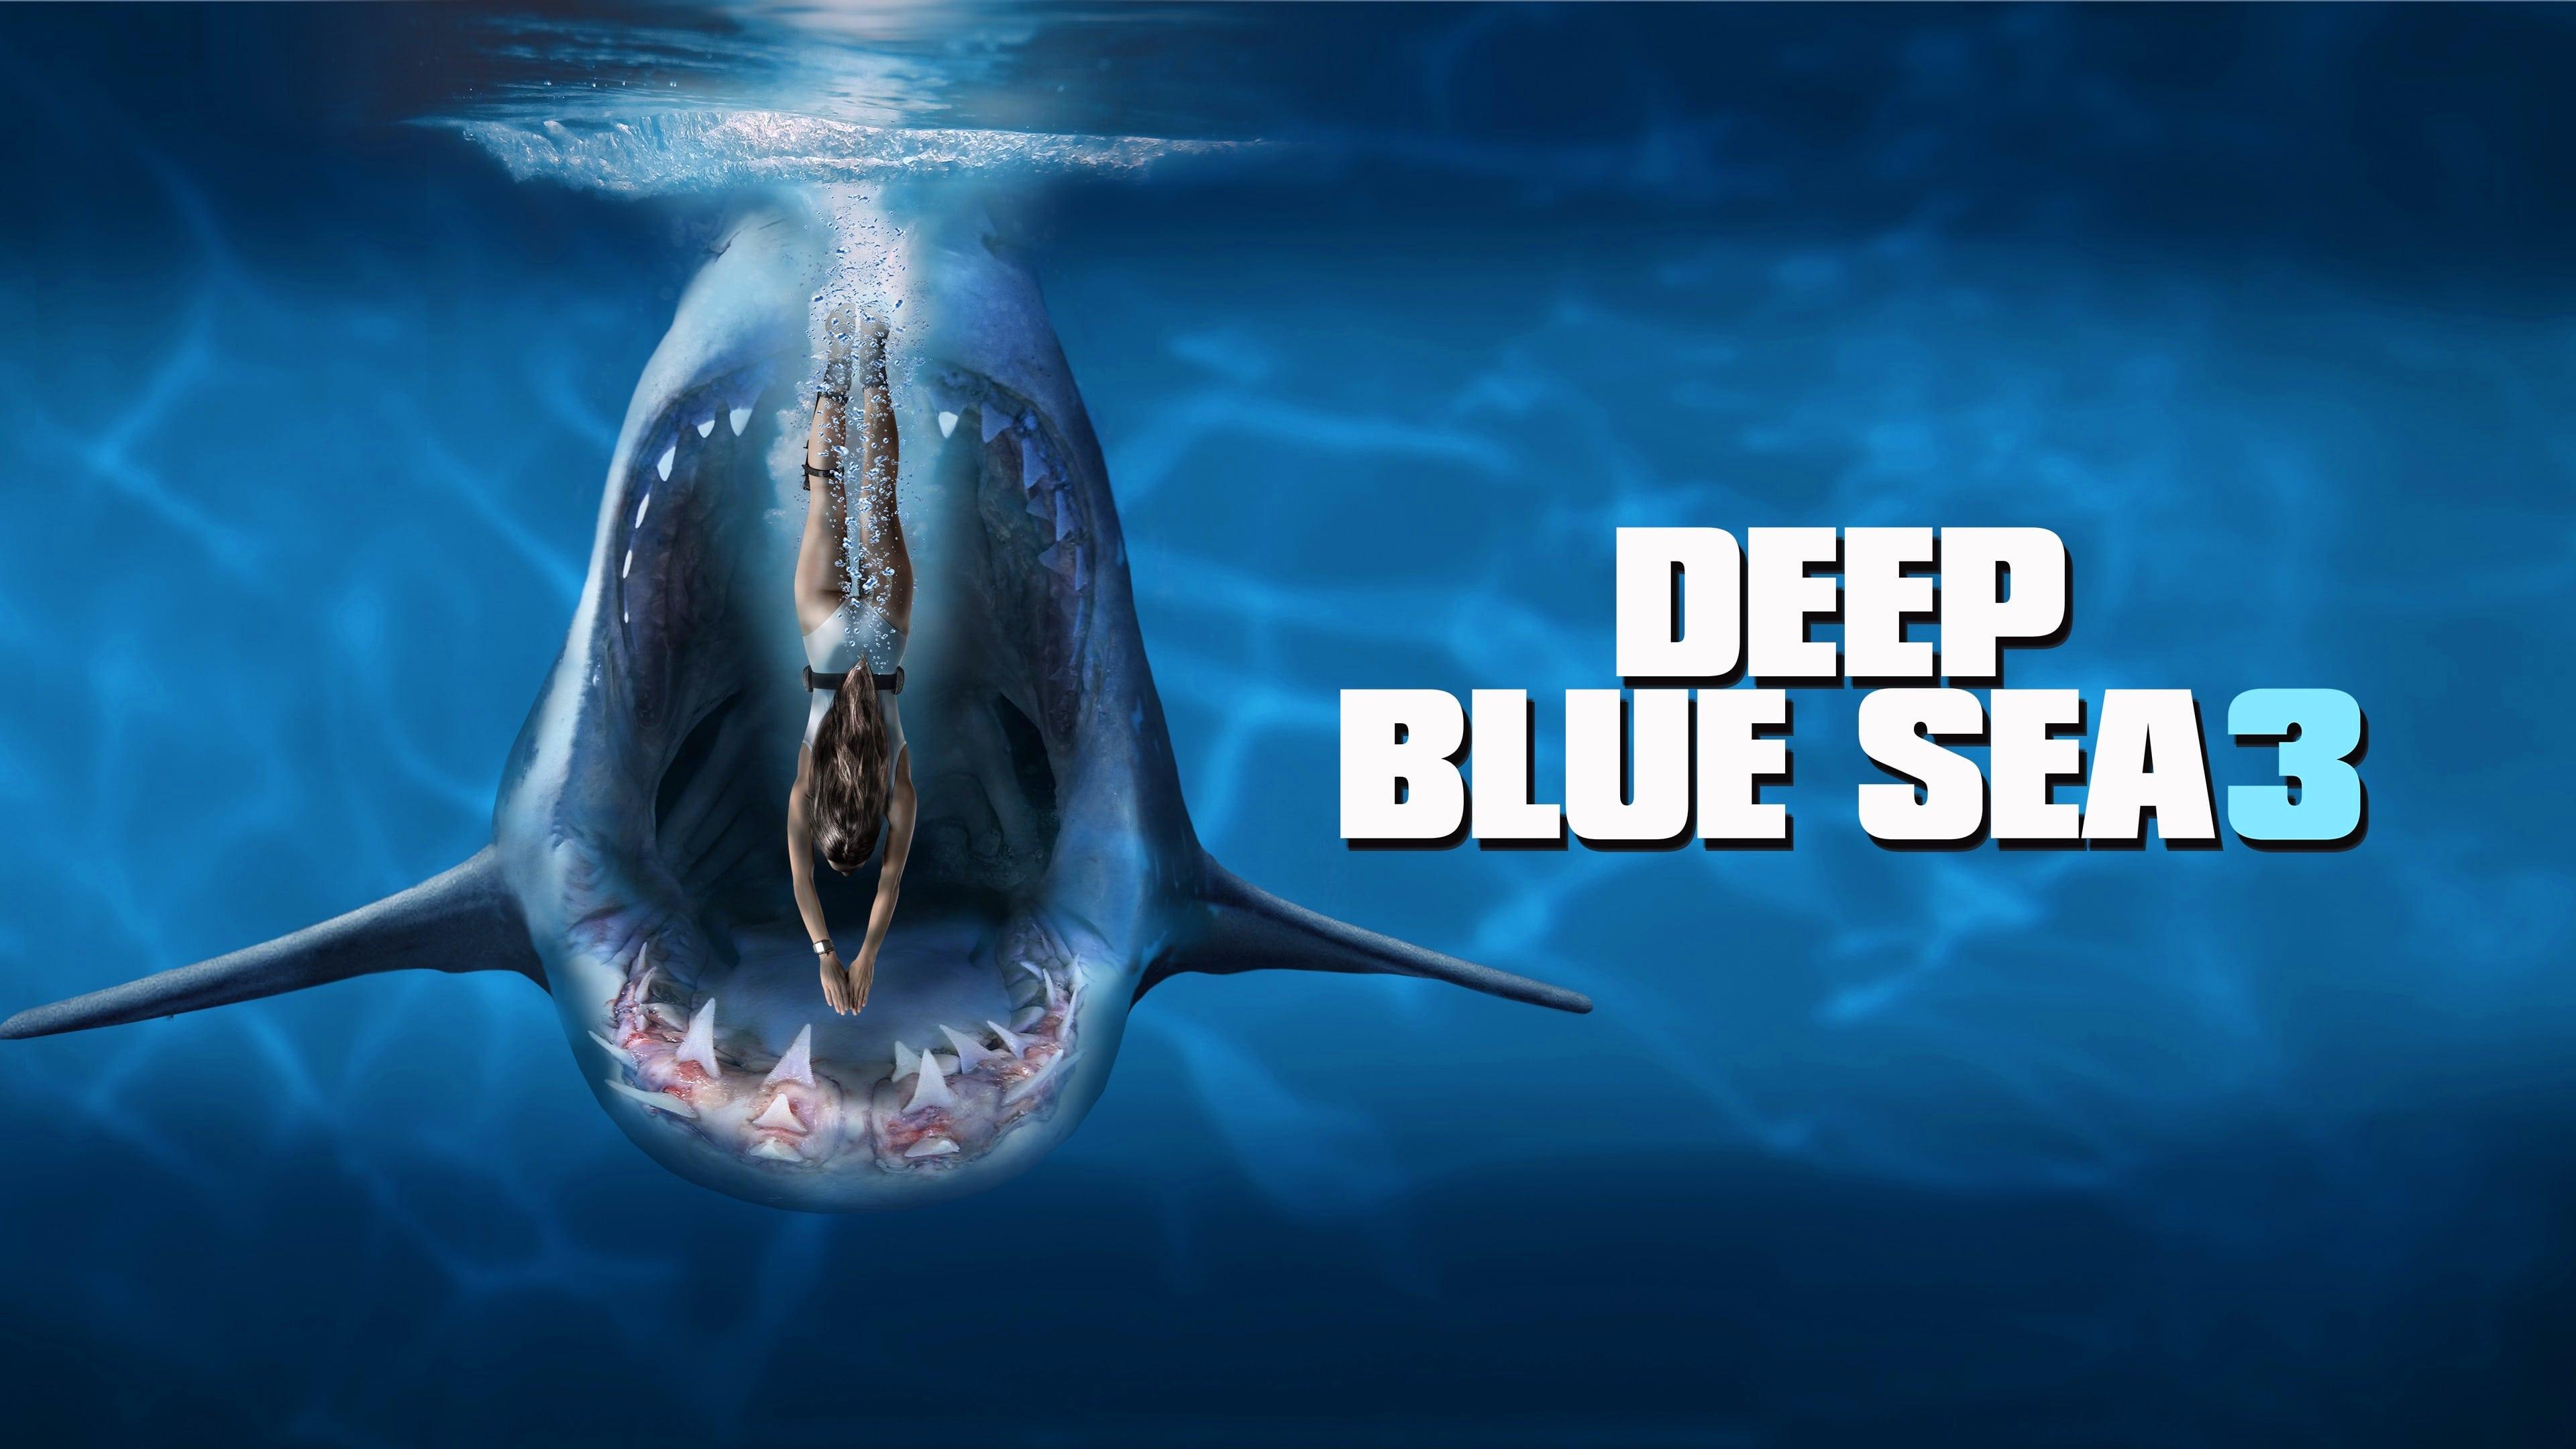 Deep Blue Sea 3